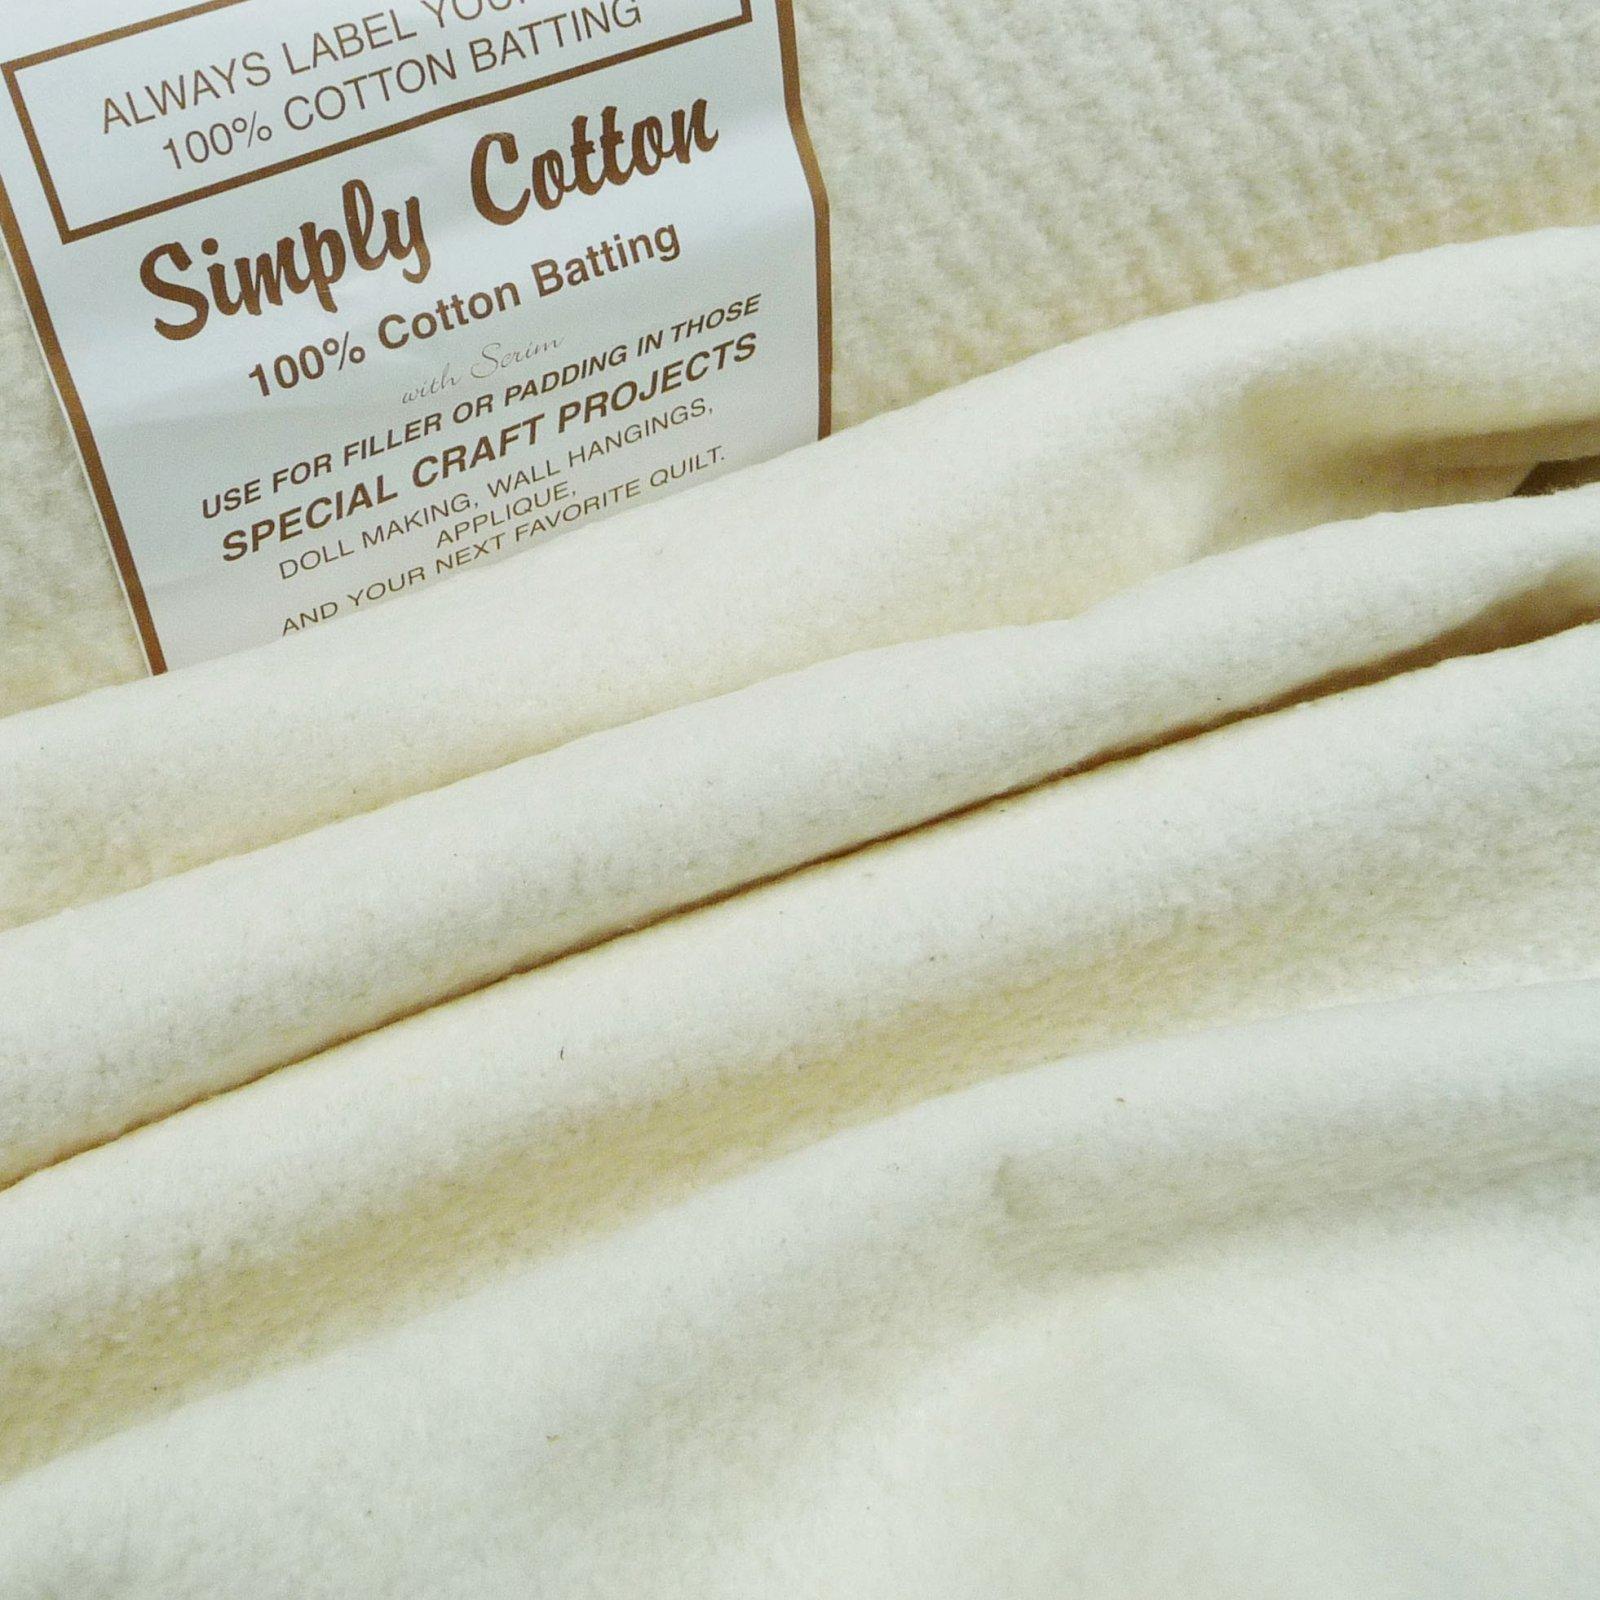 Simply Cotton Batting